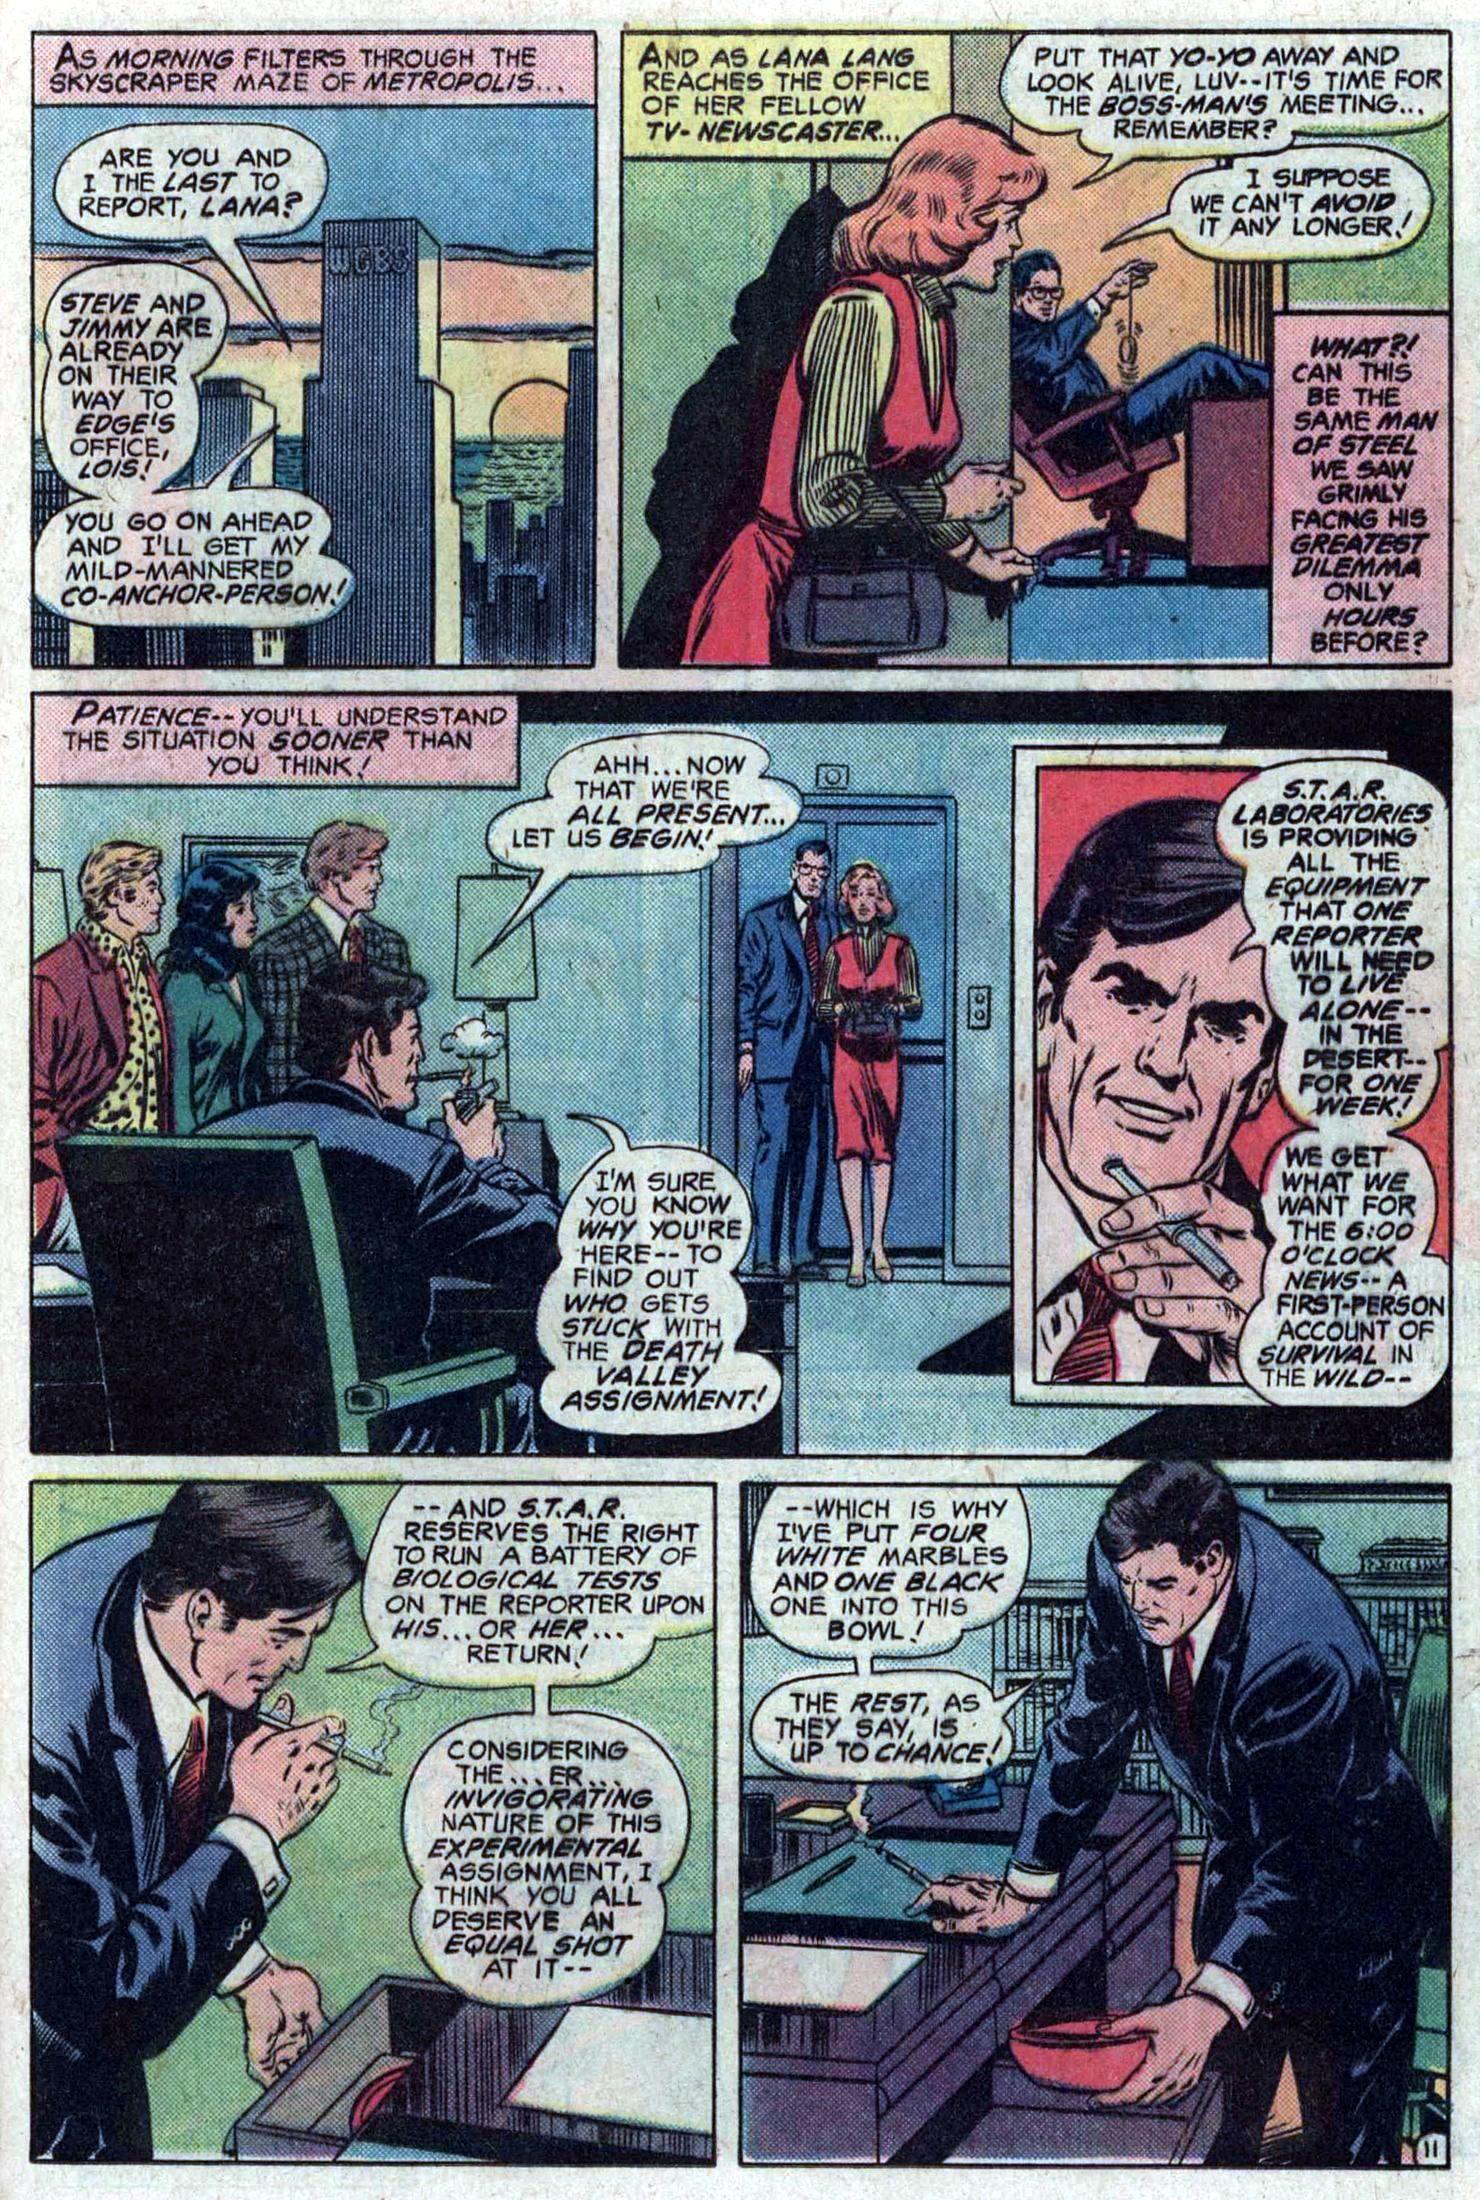 Action Comics (1938) 480 Page 20